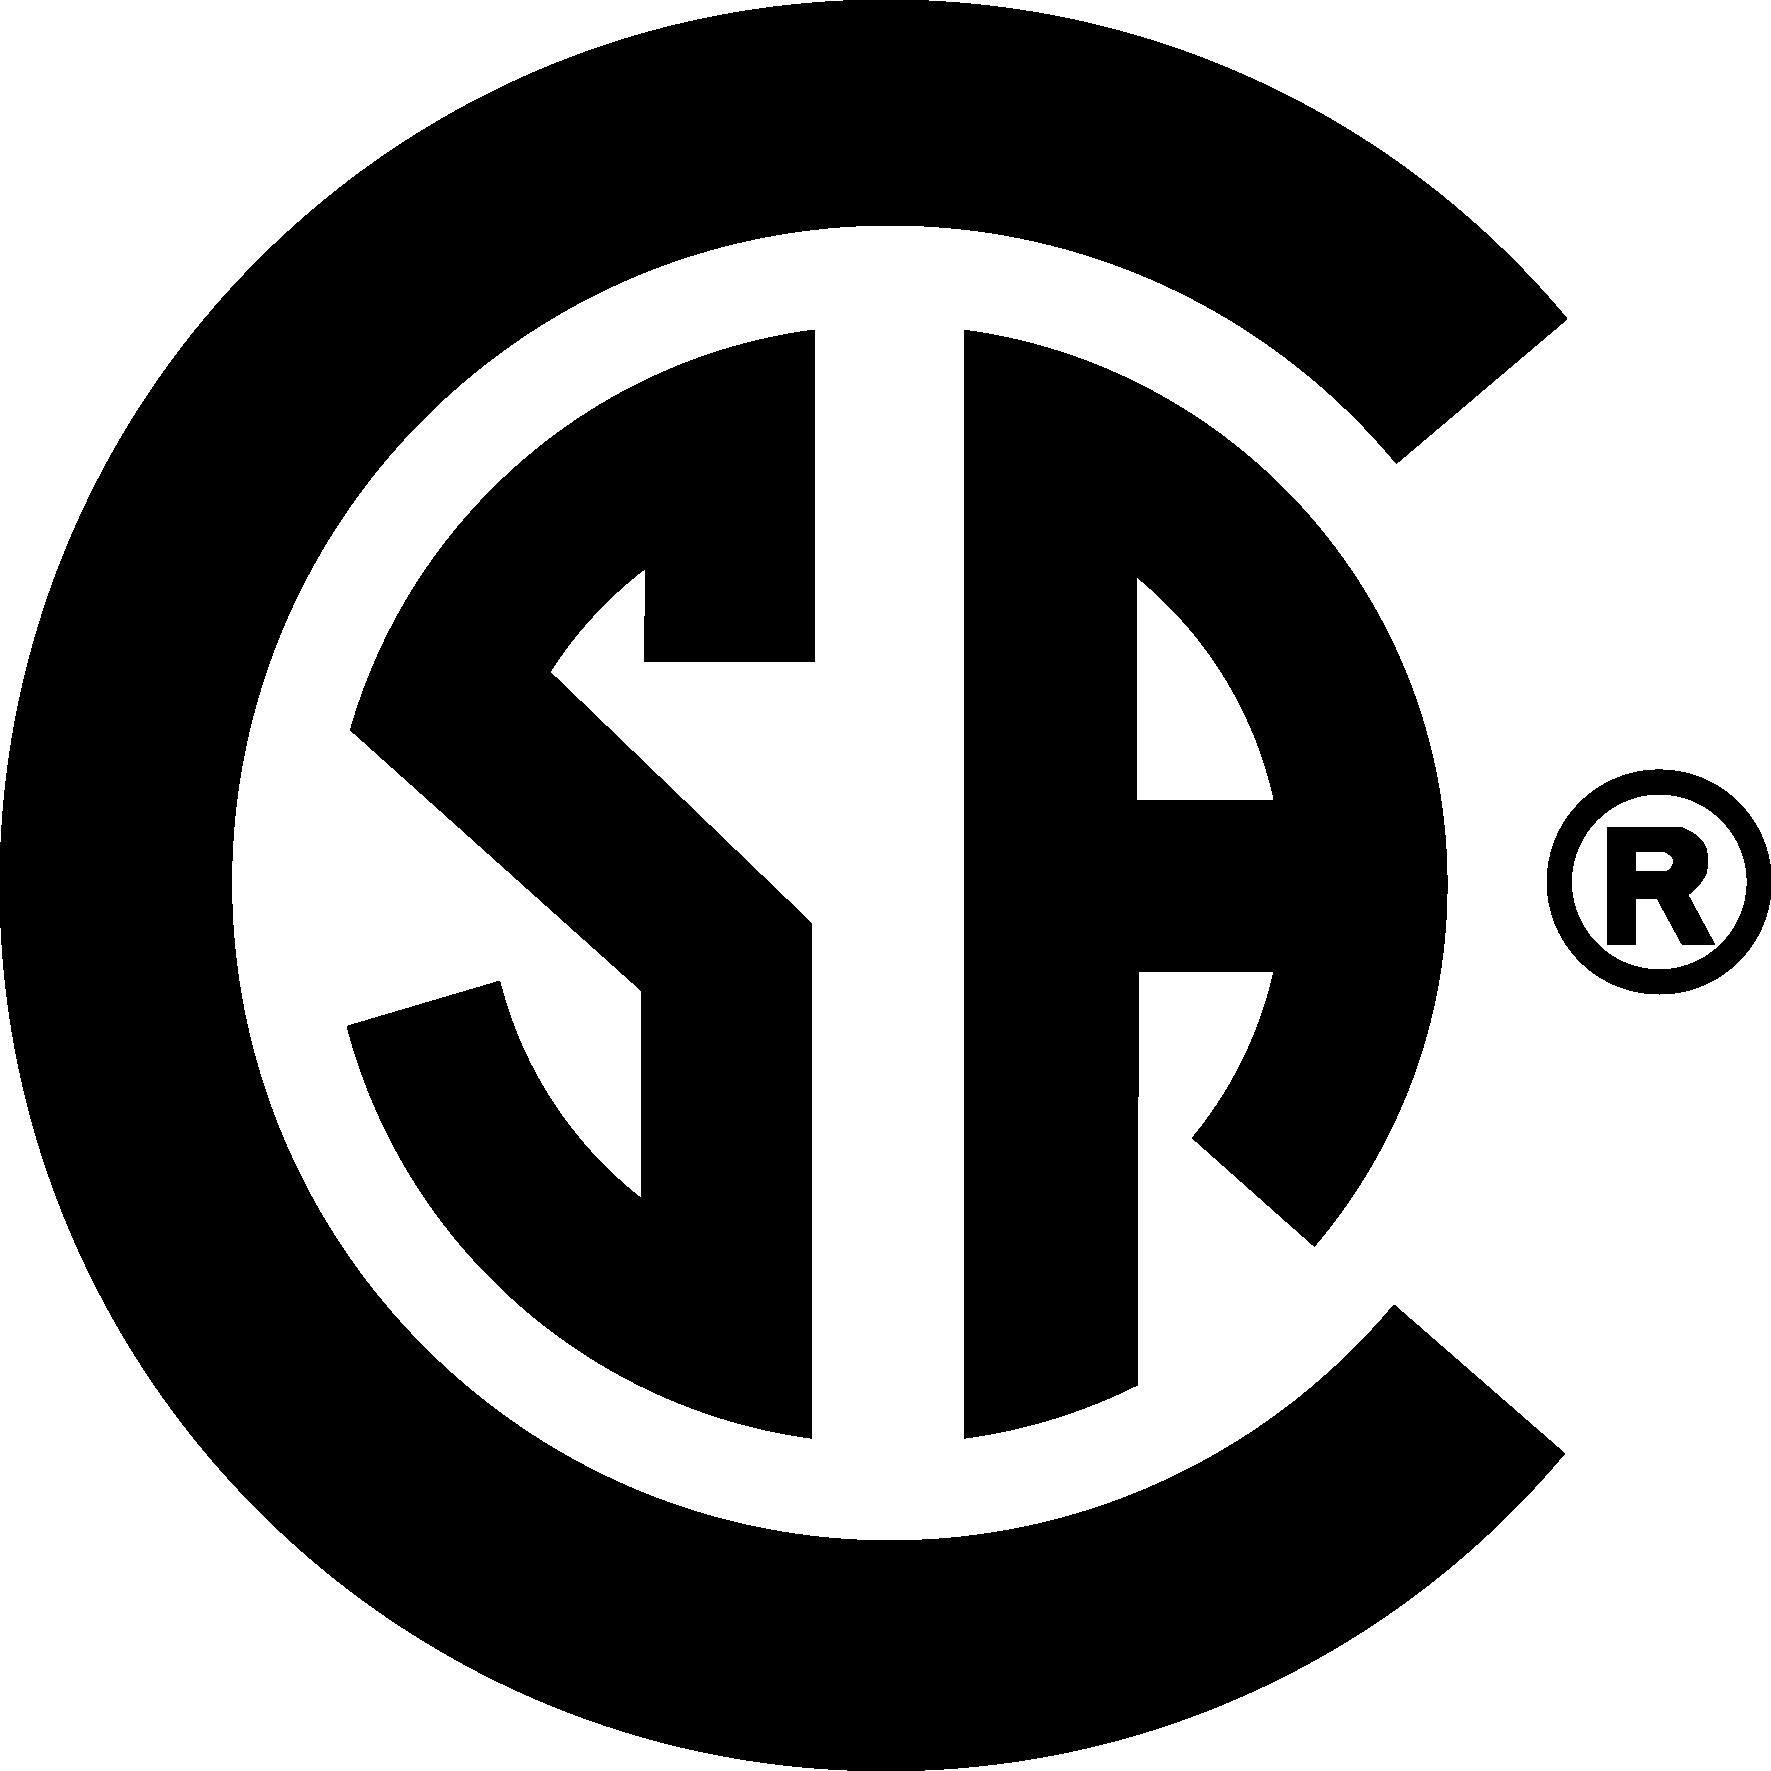 CSA Logo (Canadian Standards Association PDF) PNG Free